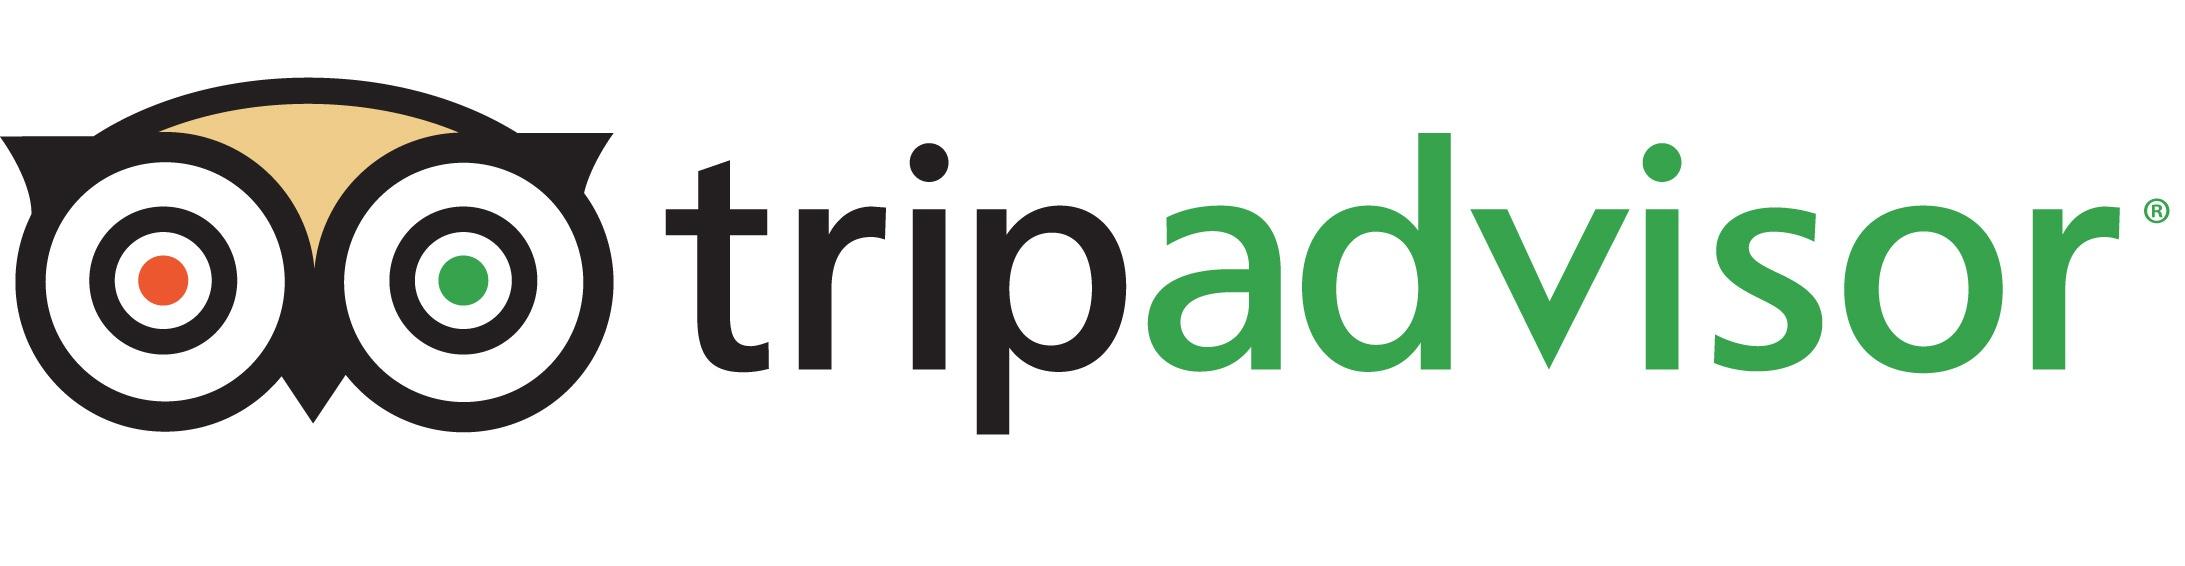 What To Do In Japan - Using TripAdvisor.com - Trip Advisor Logo